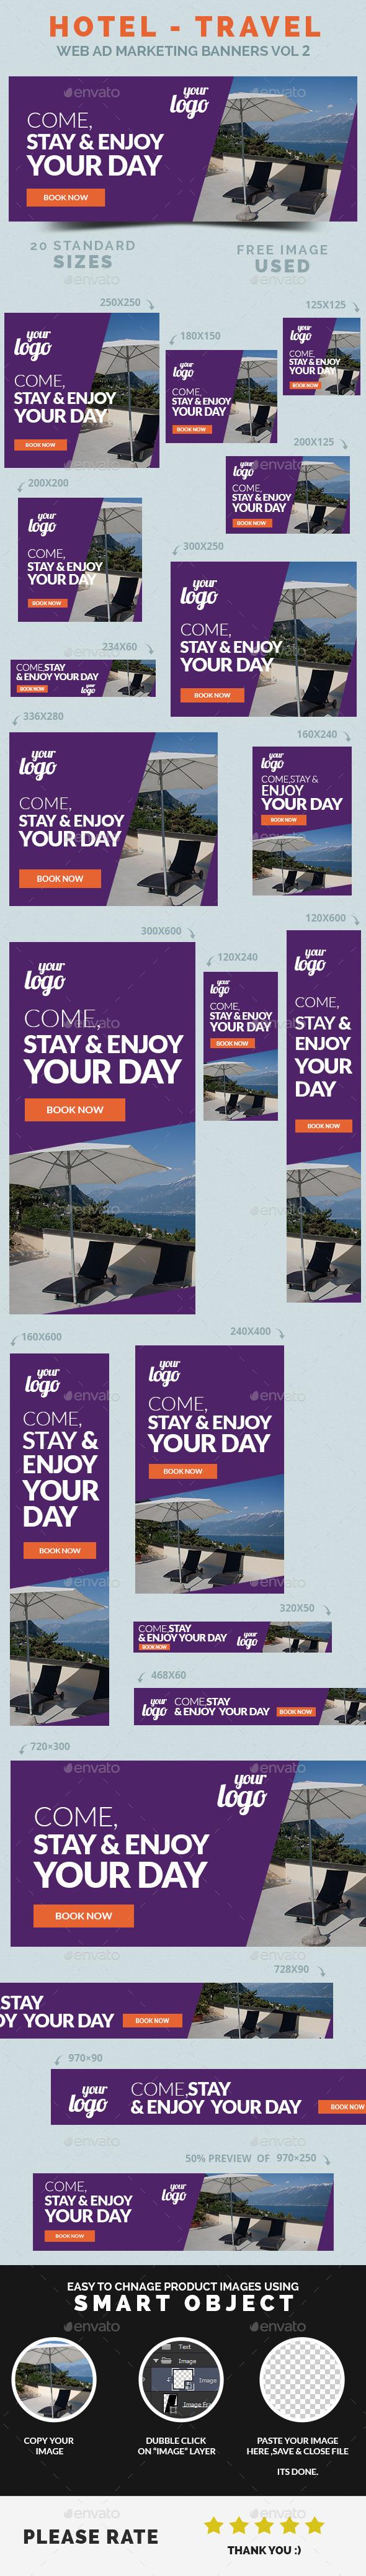 GraphicRiver Hotel Travel Web Ad Marketing Banners Vol 2 9092555